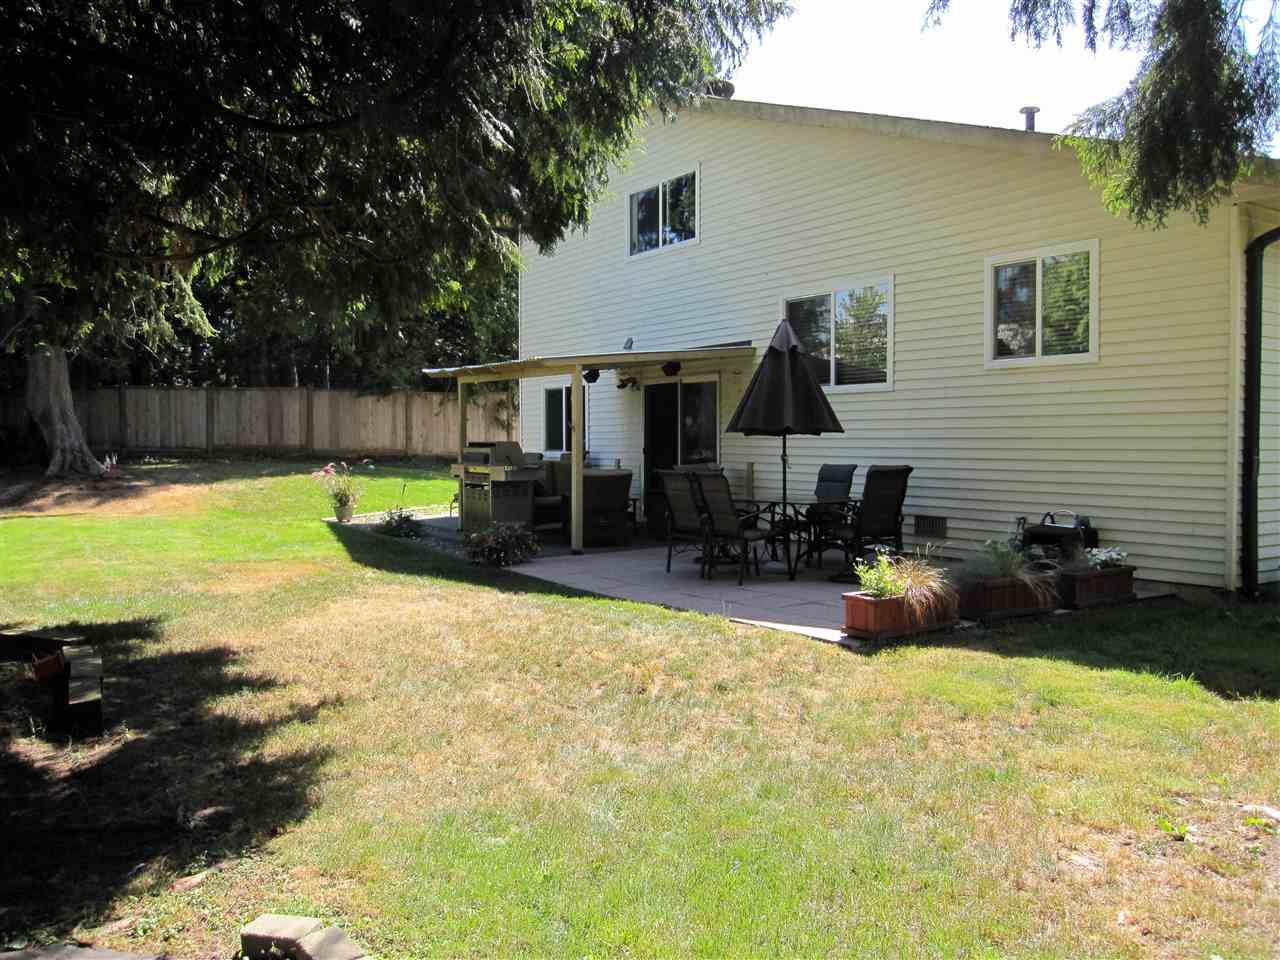 Photo 15: Photos: 21155 CUTLER Place in Maple Ridge: Southwest Maple Ridge House for sale : MLS®# R2101980